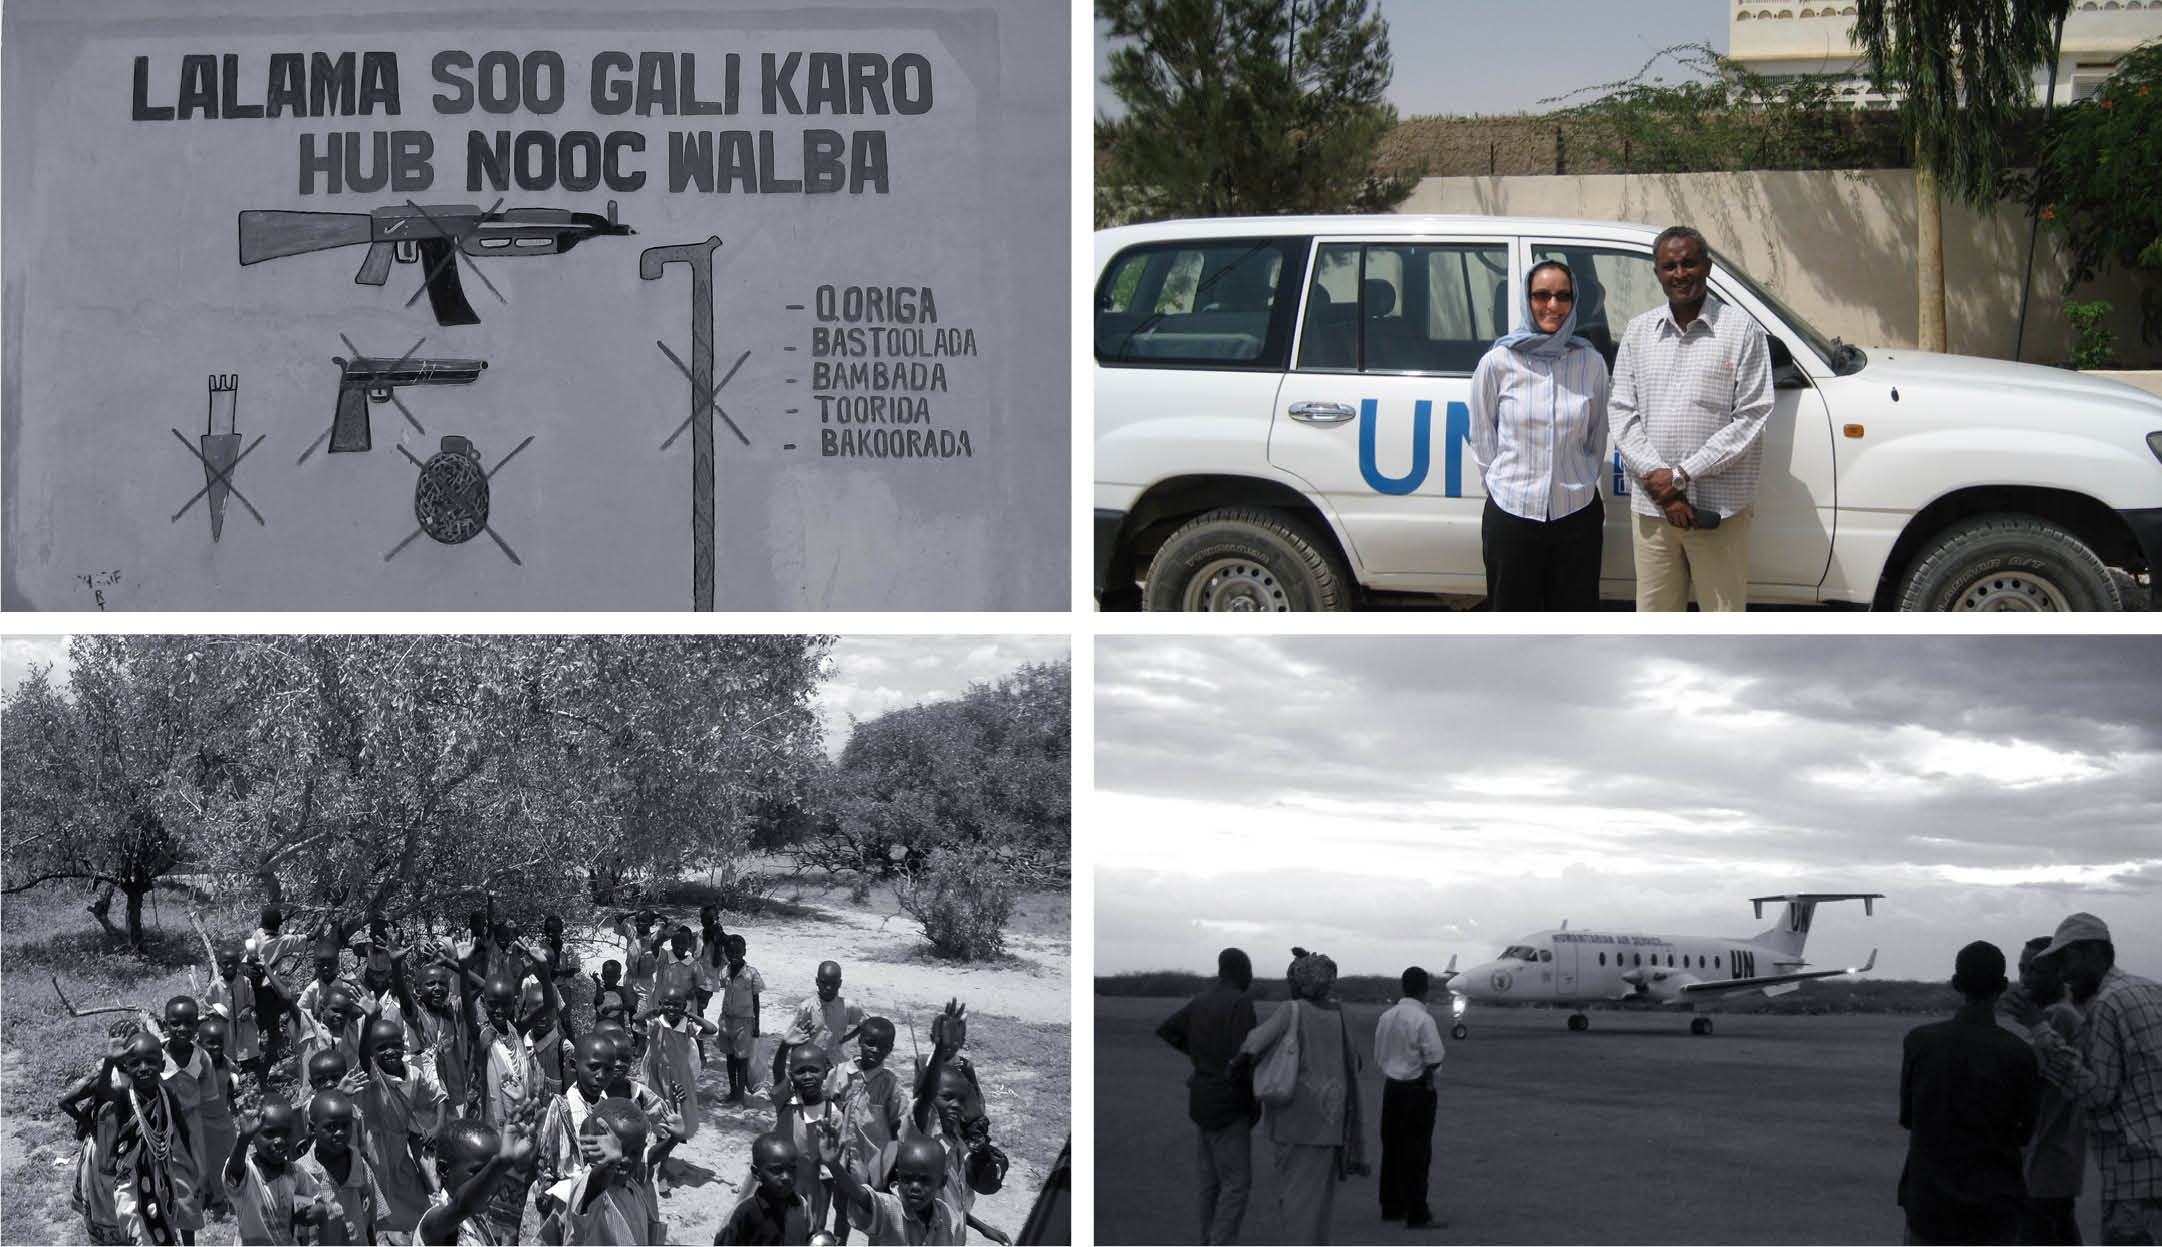 UNDP Somalia, Hargeisa, Somaliland 2006